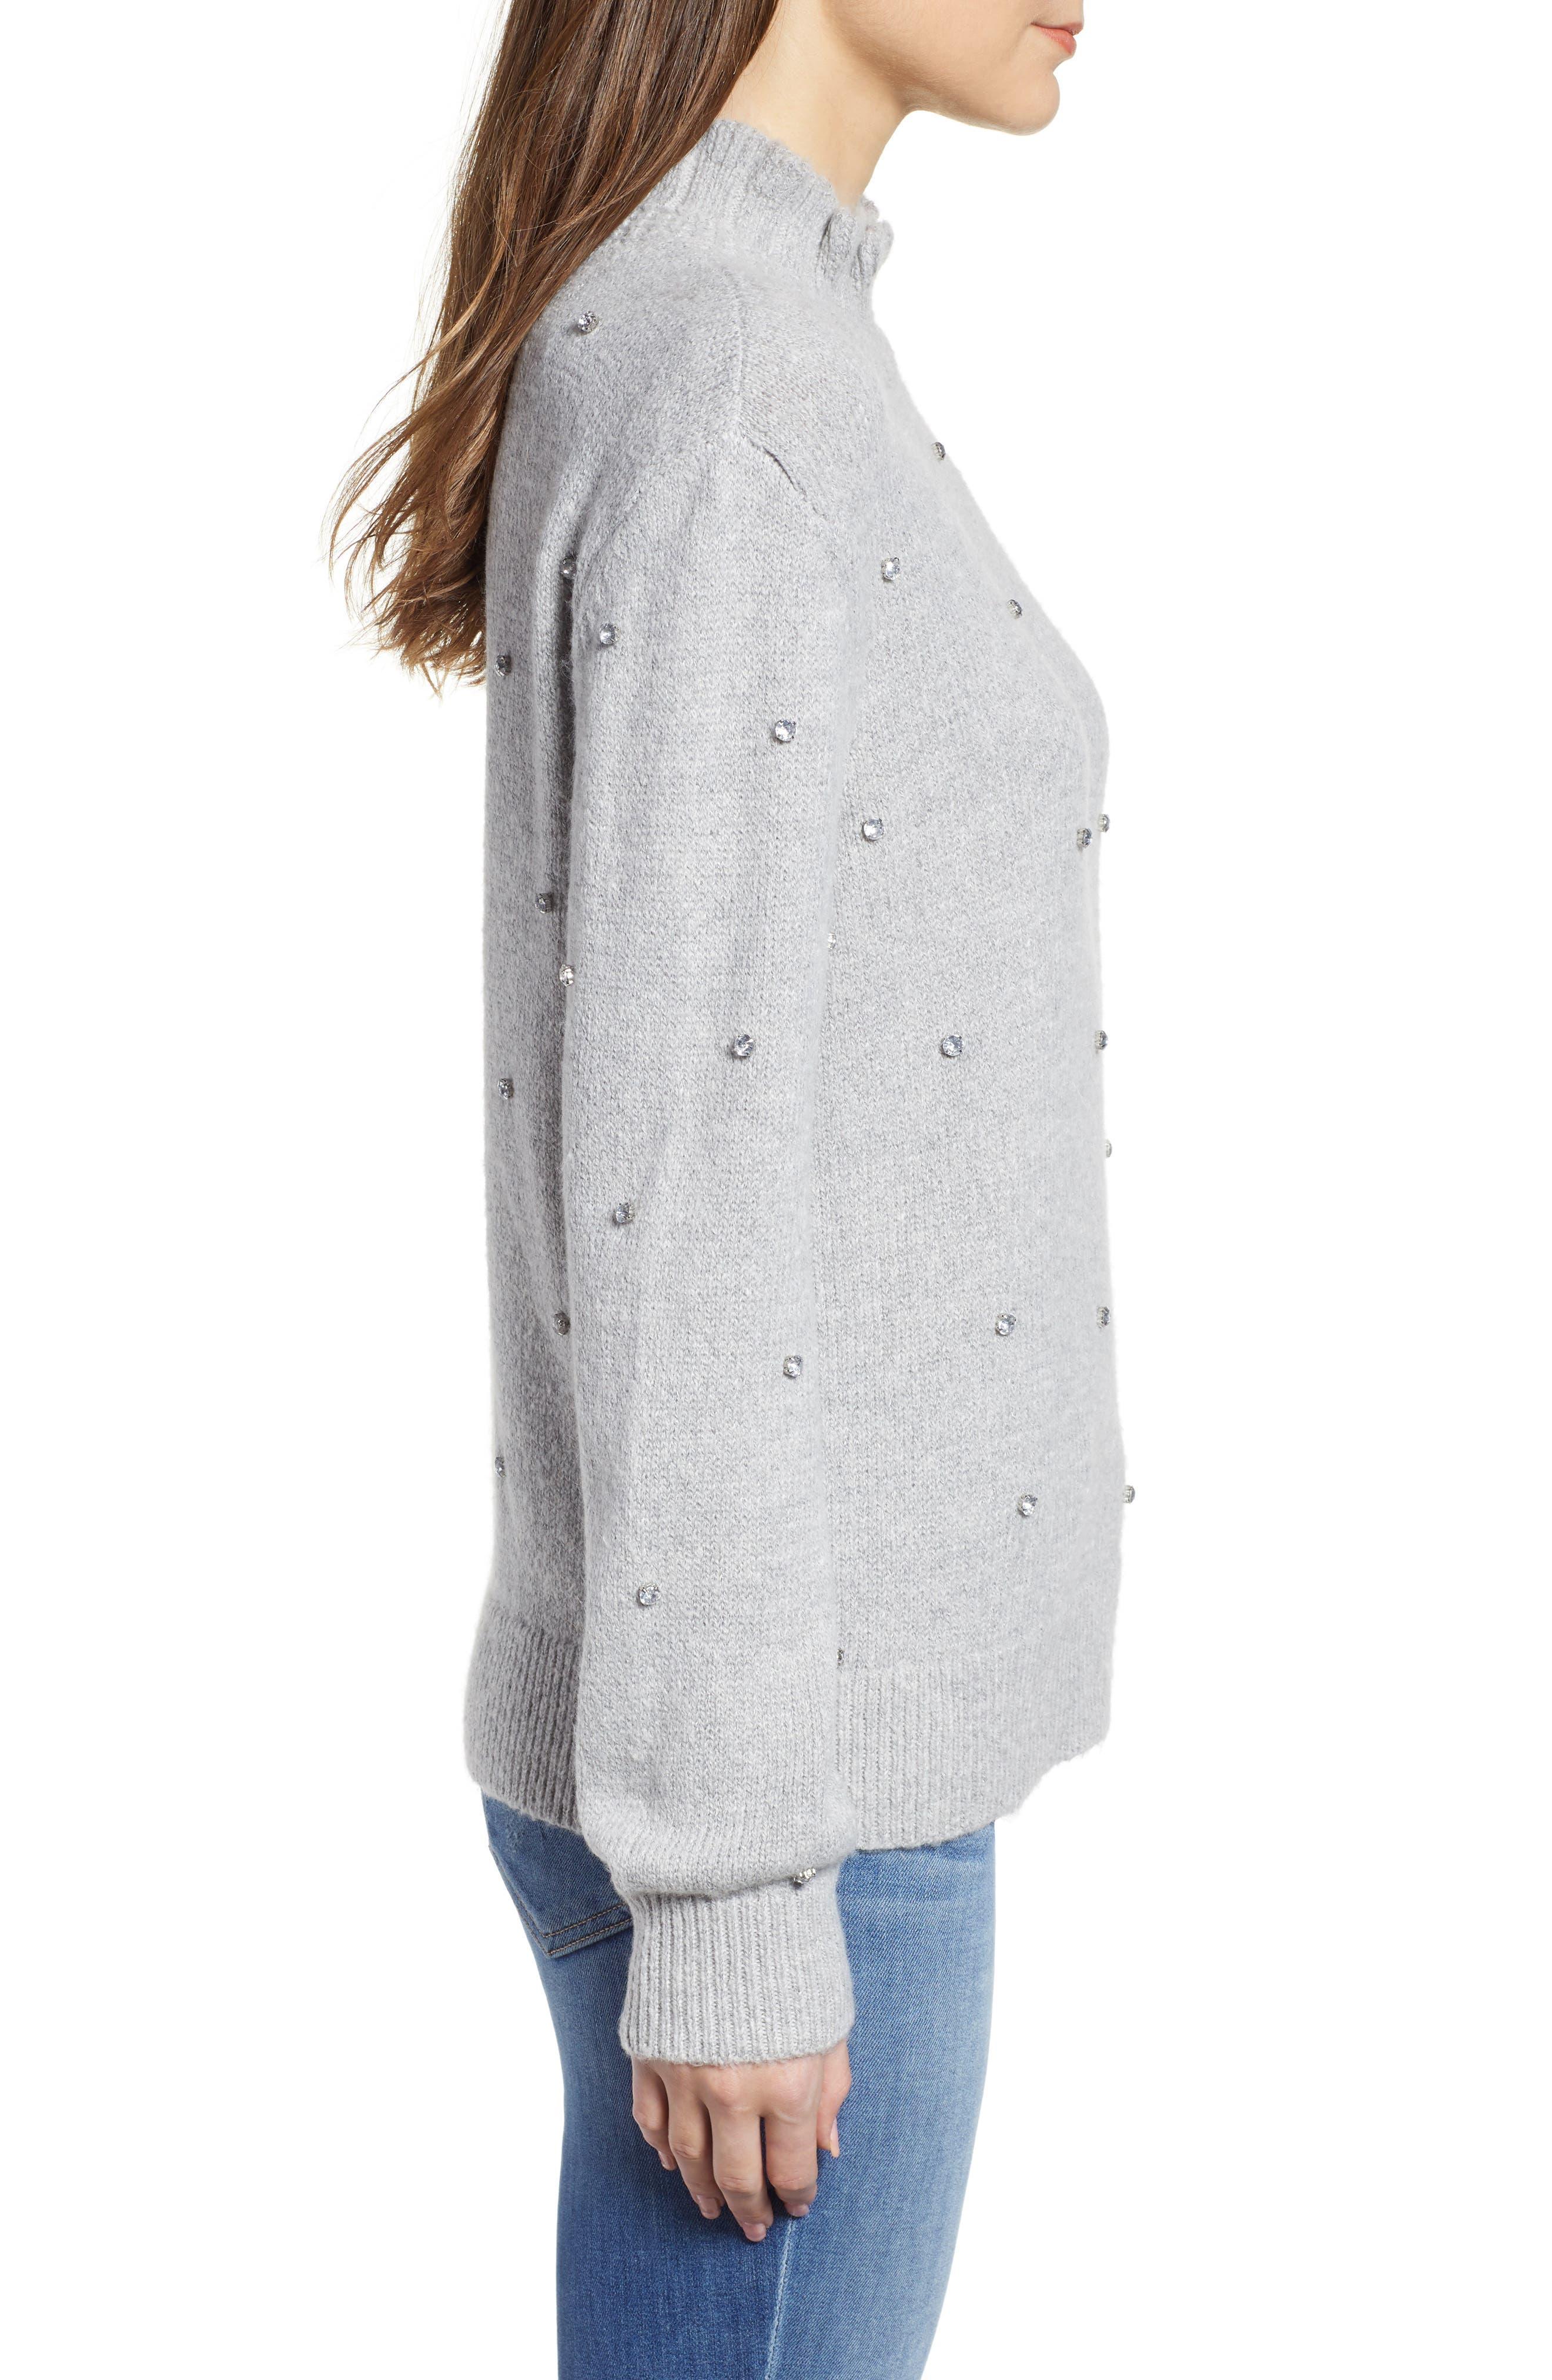 Embellished Ruffle Neck Sweater,                             Alternate thumbnail 3, color,                             GREY LIGHT HEATHER